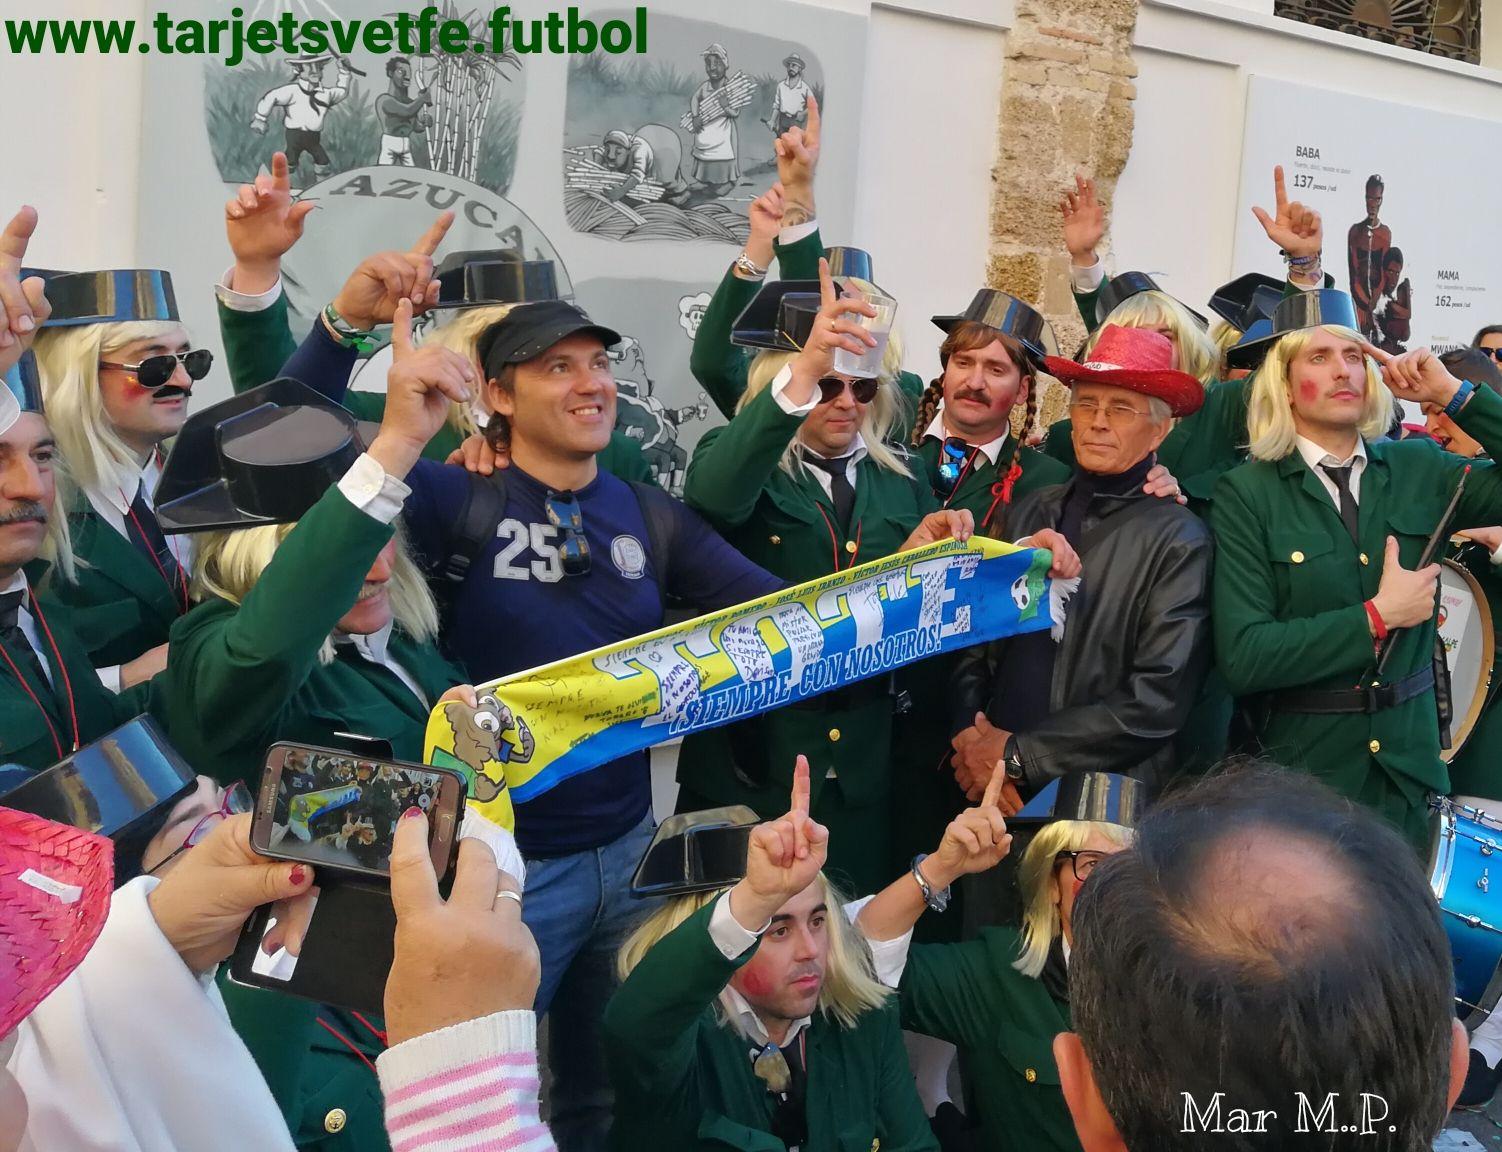 Bufanda personalizada homenaje a Tote